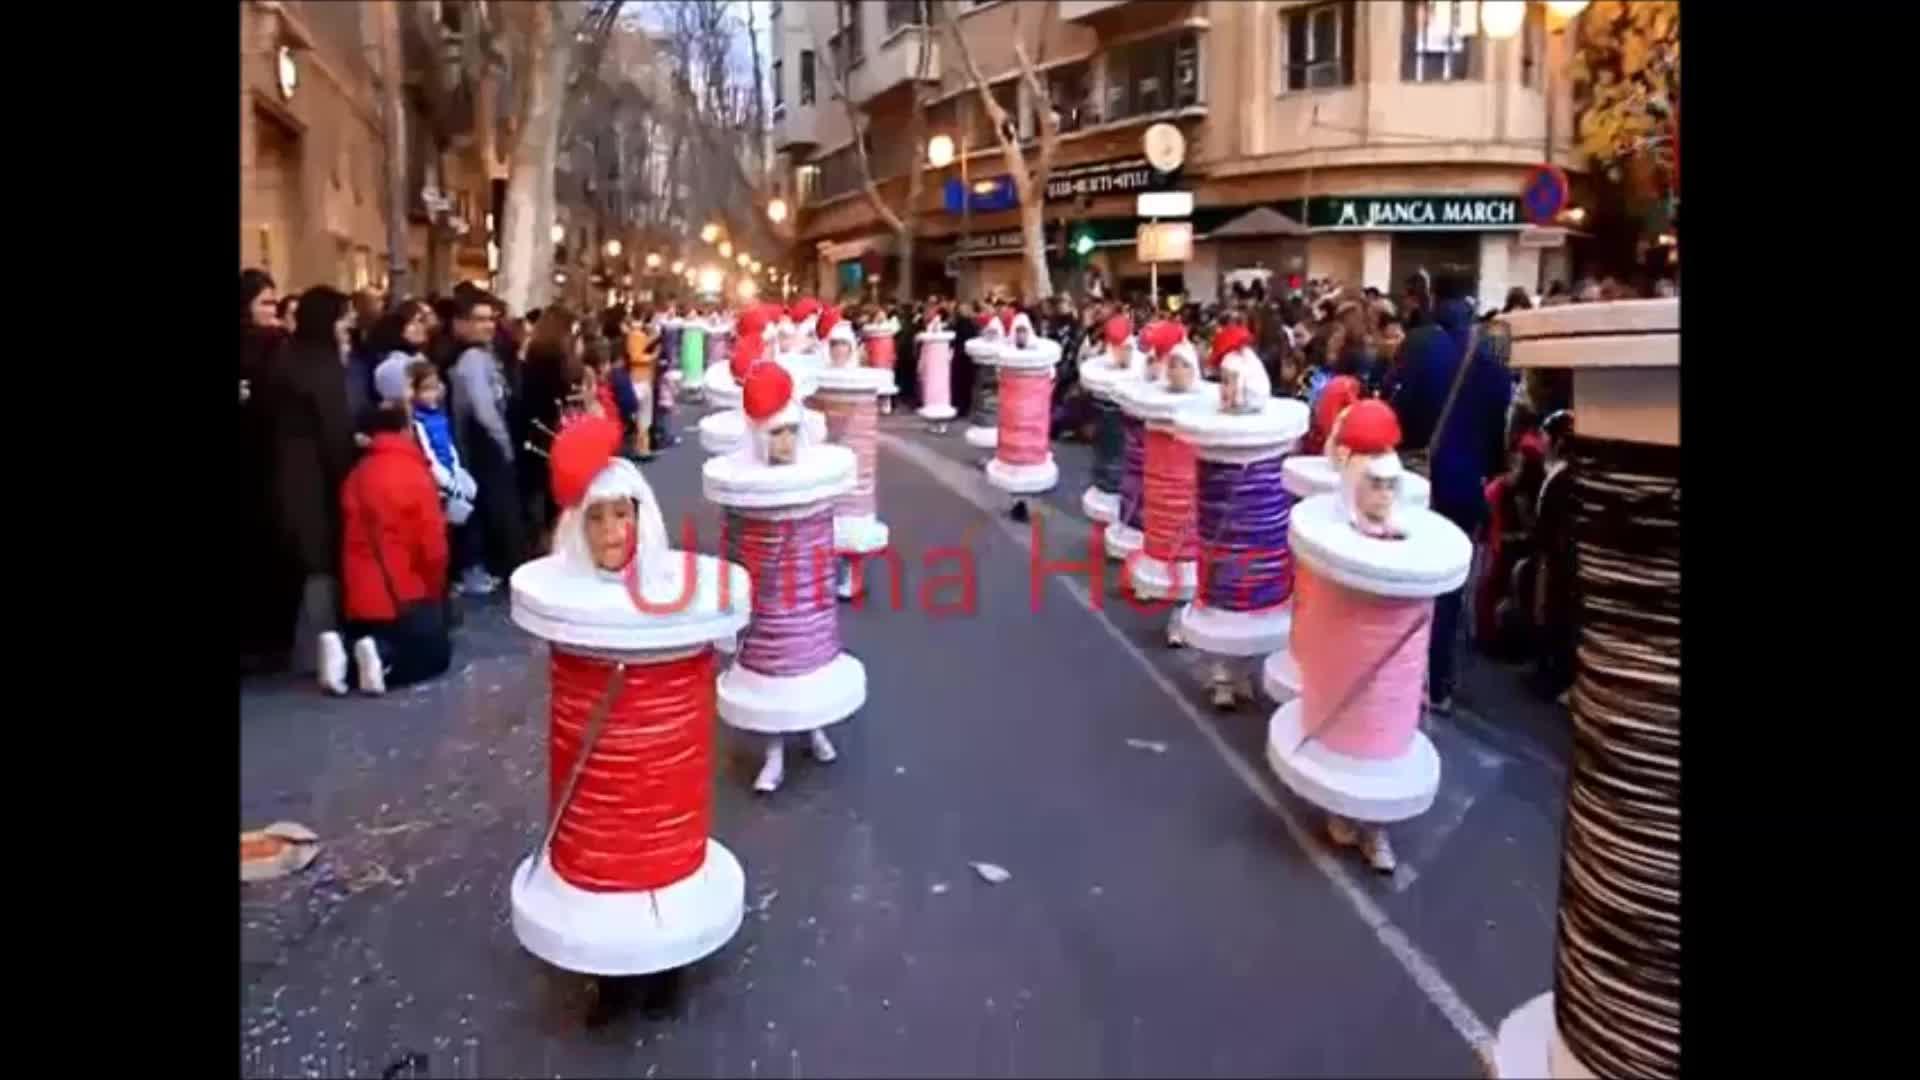 Un colorido carnaval 2016 inunda Mallorca